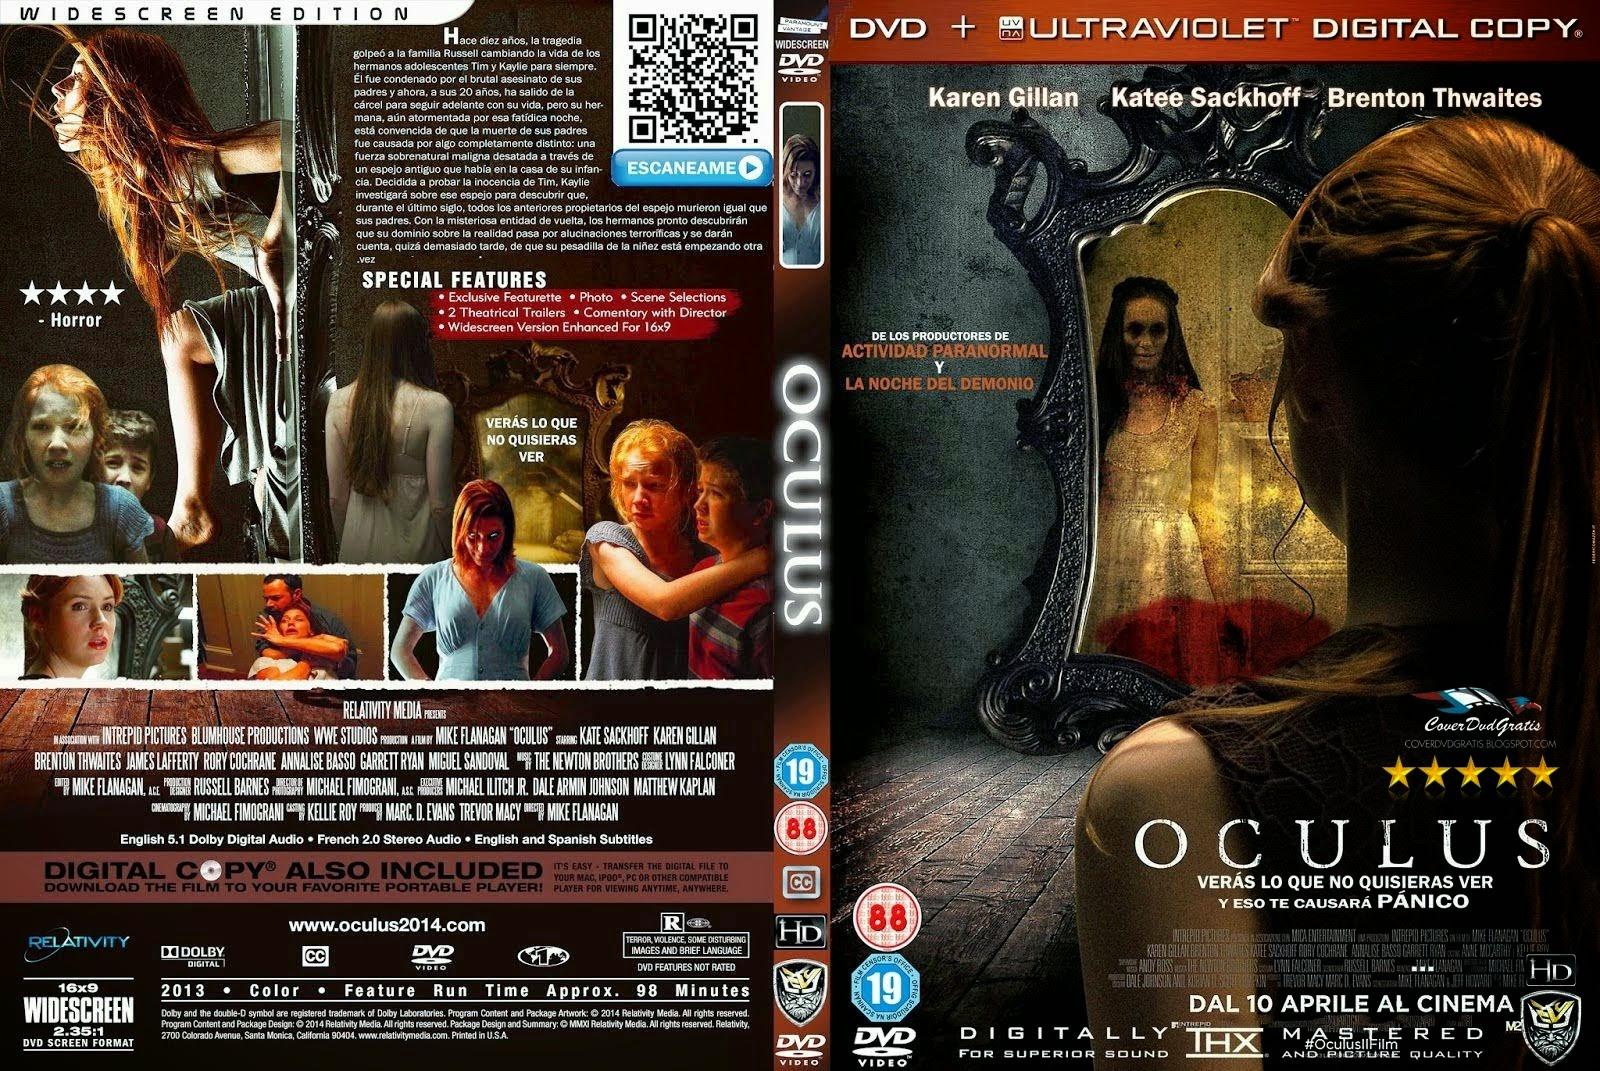 Oculus El Espejo Del Mal DVD